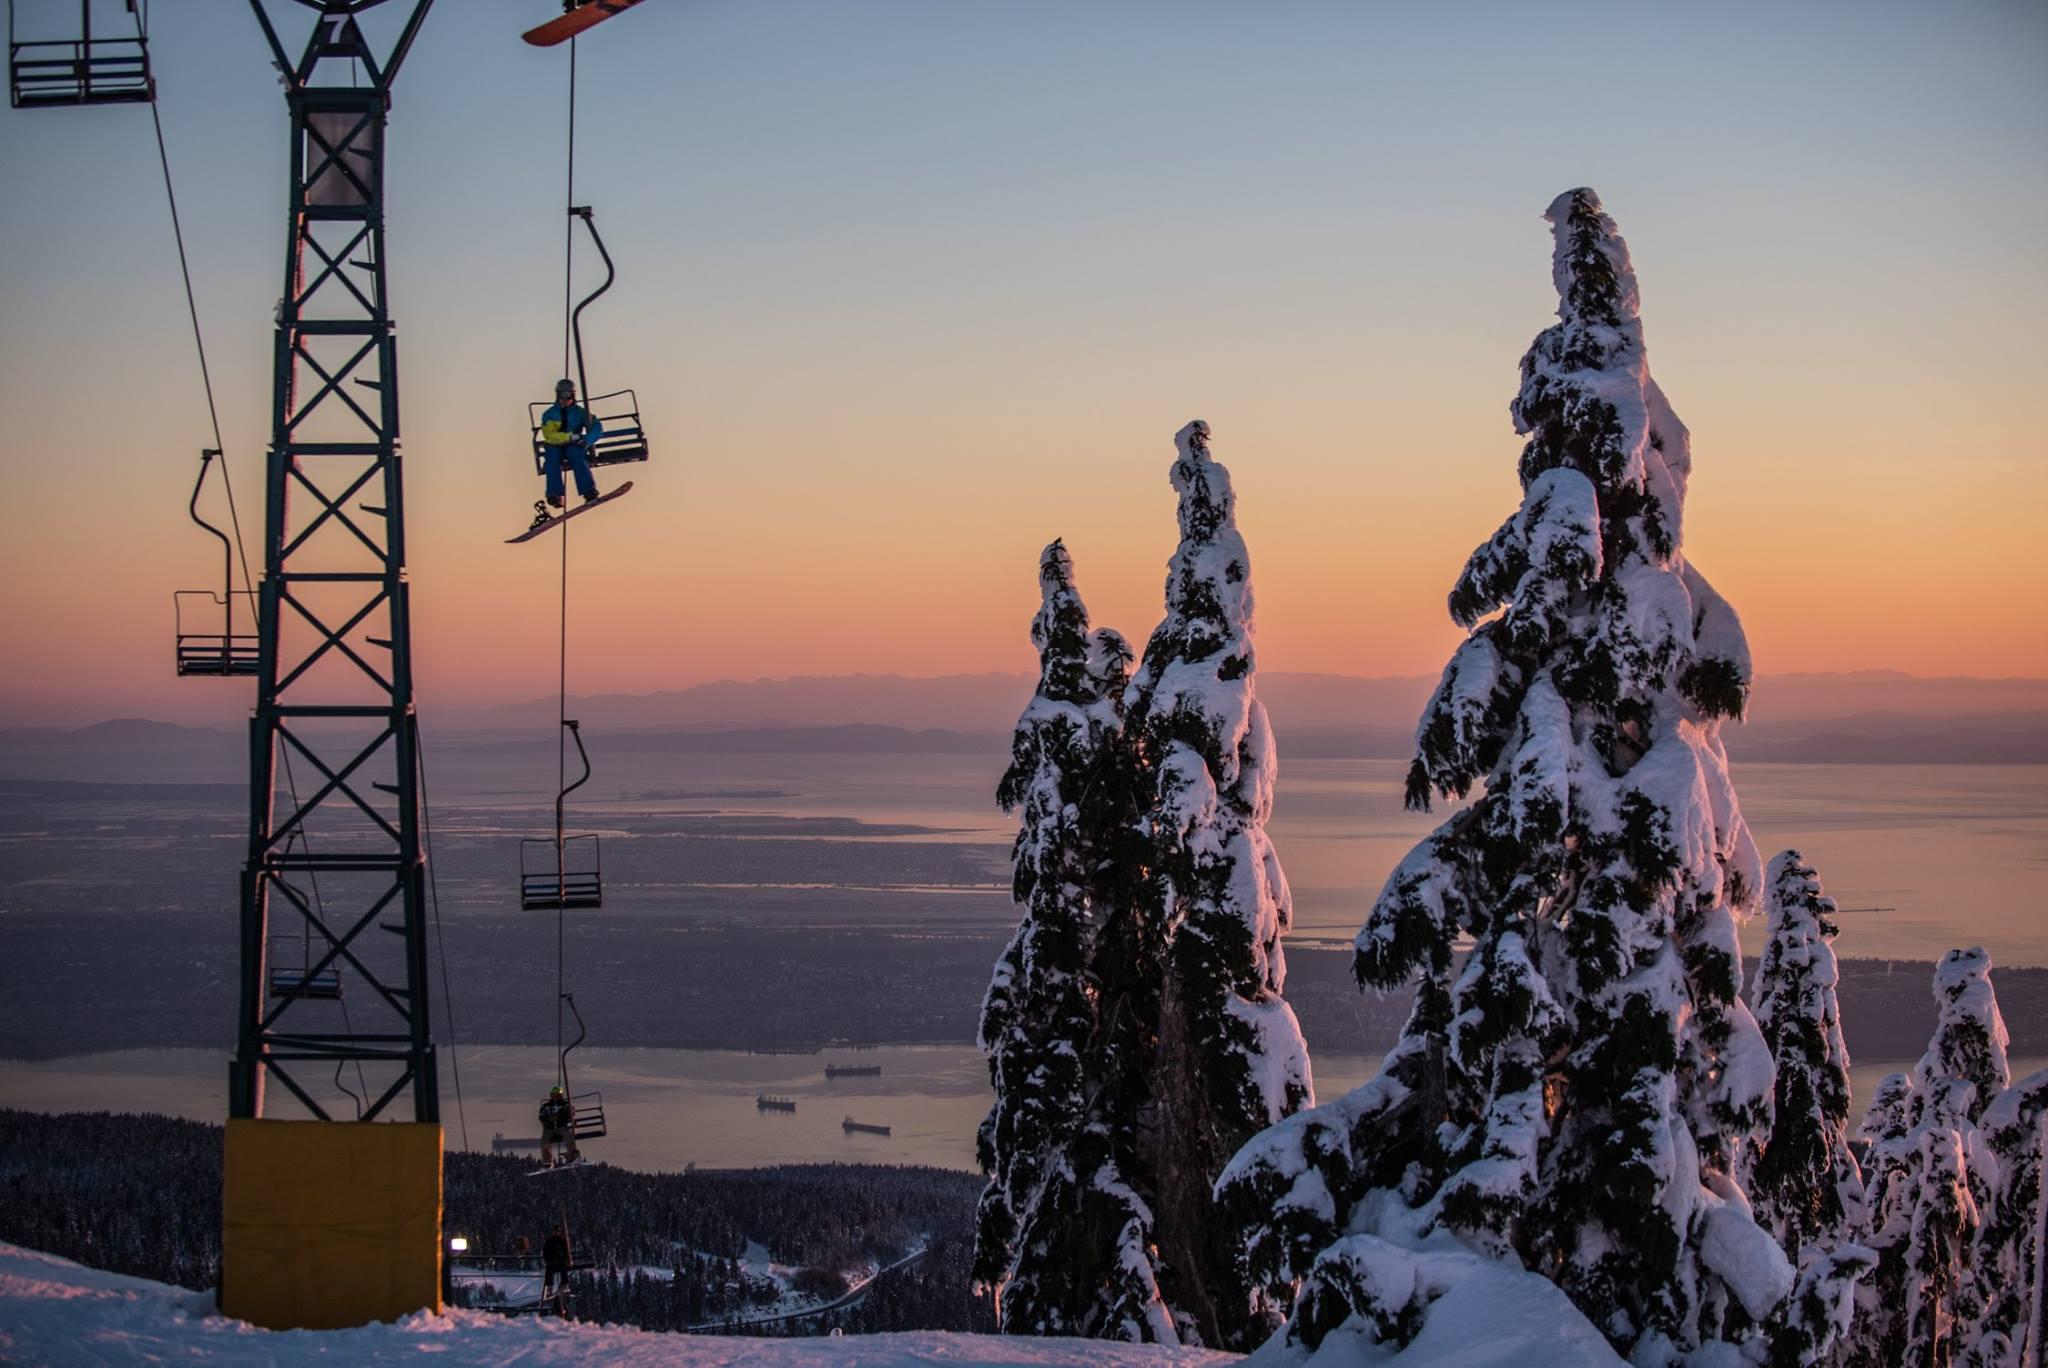 Cypress Mountain, B.C. on December 16th, 2016. photo: Peter Lonergan